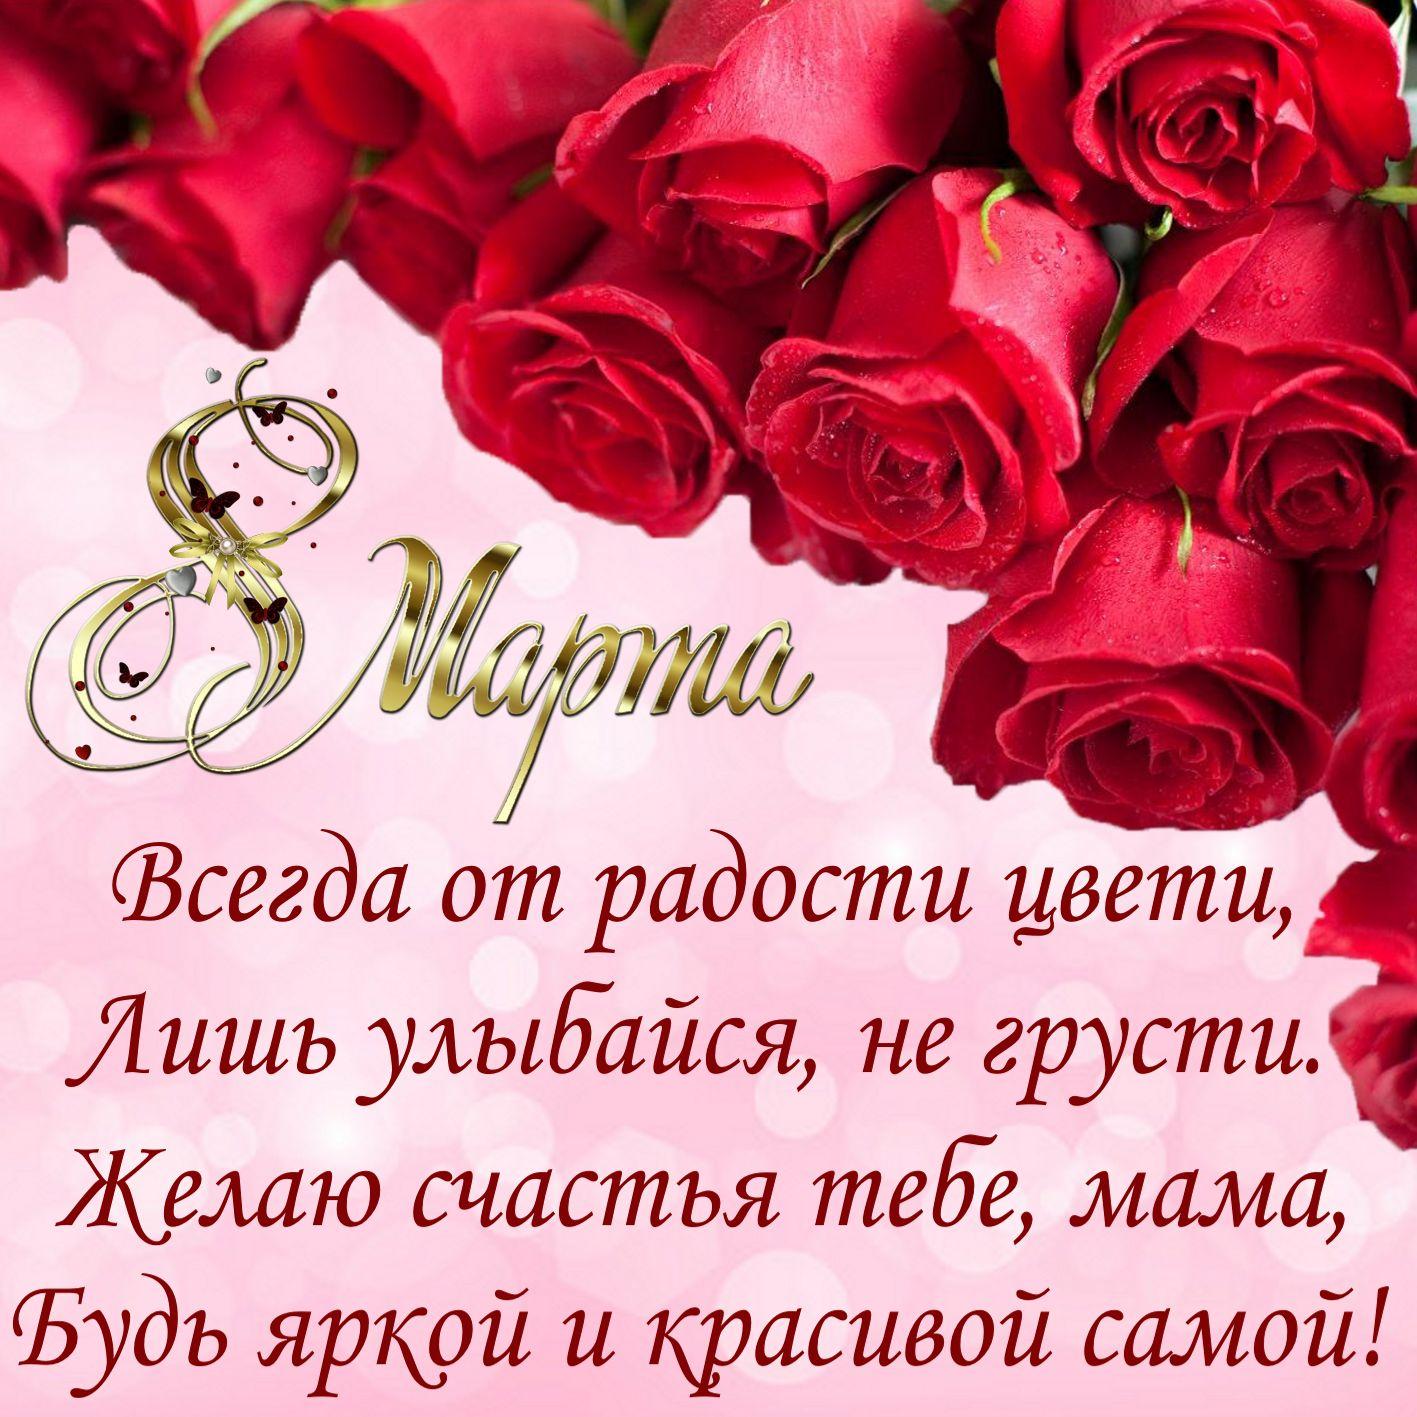 Поздравление на 8 марта маме от дочке